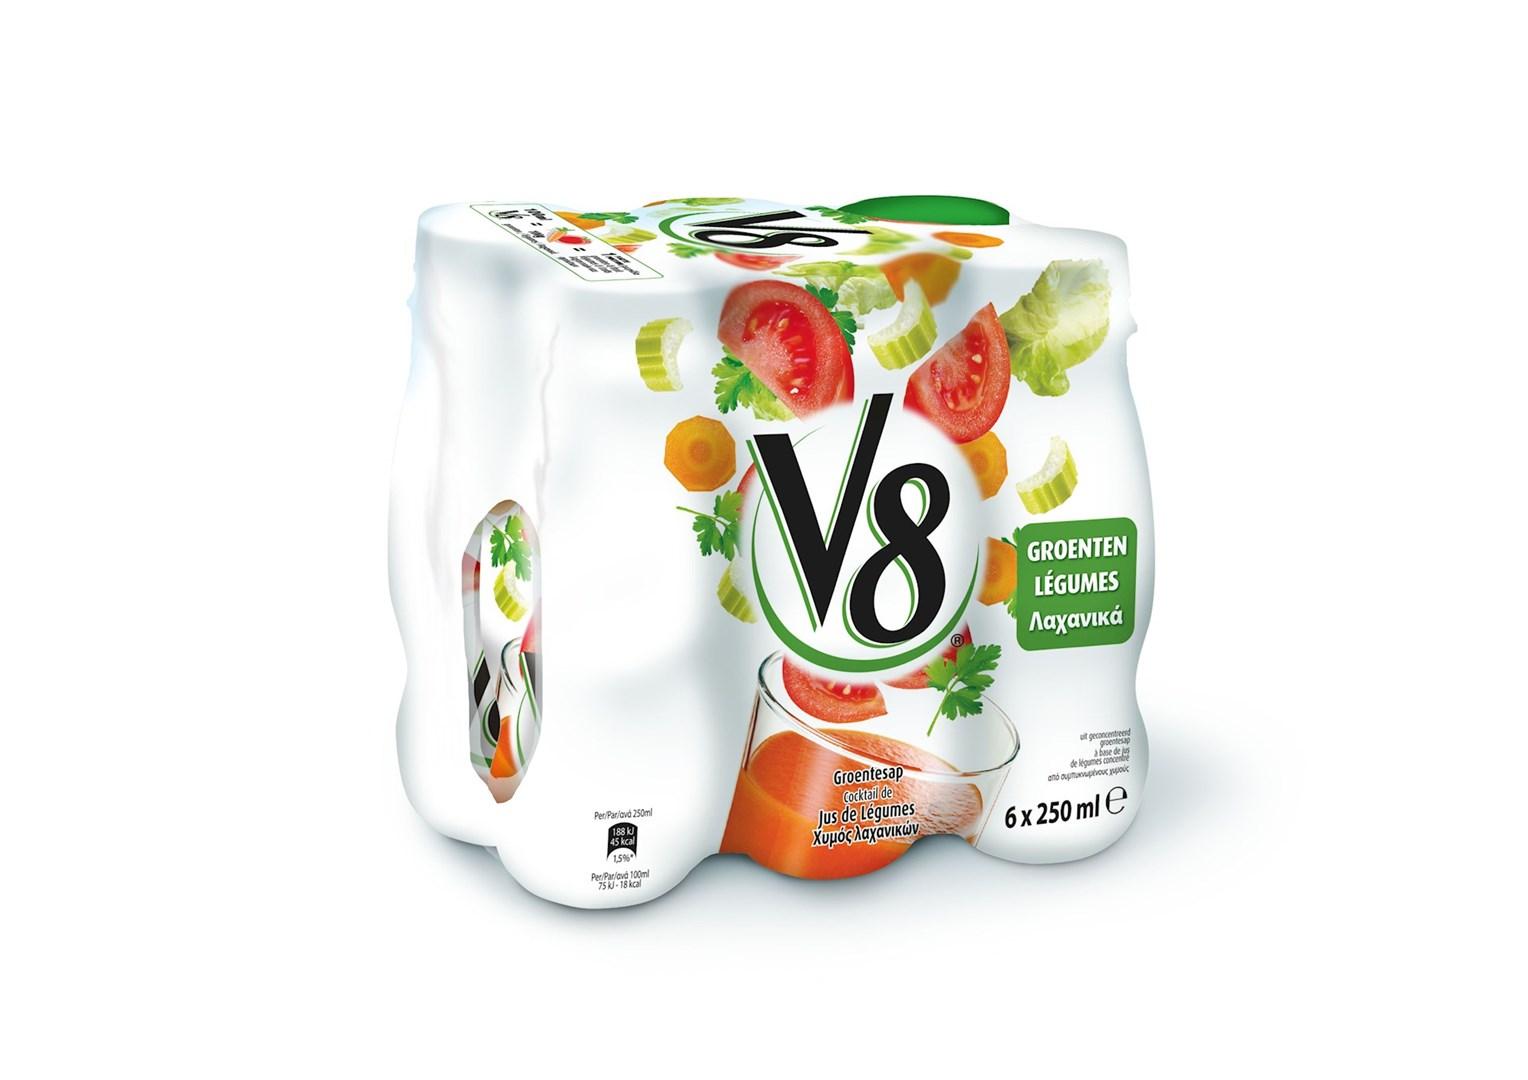 Productafbeelding V8 Groentesap 250 ml Fles